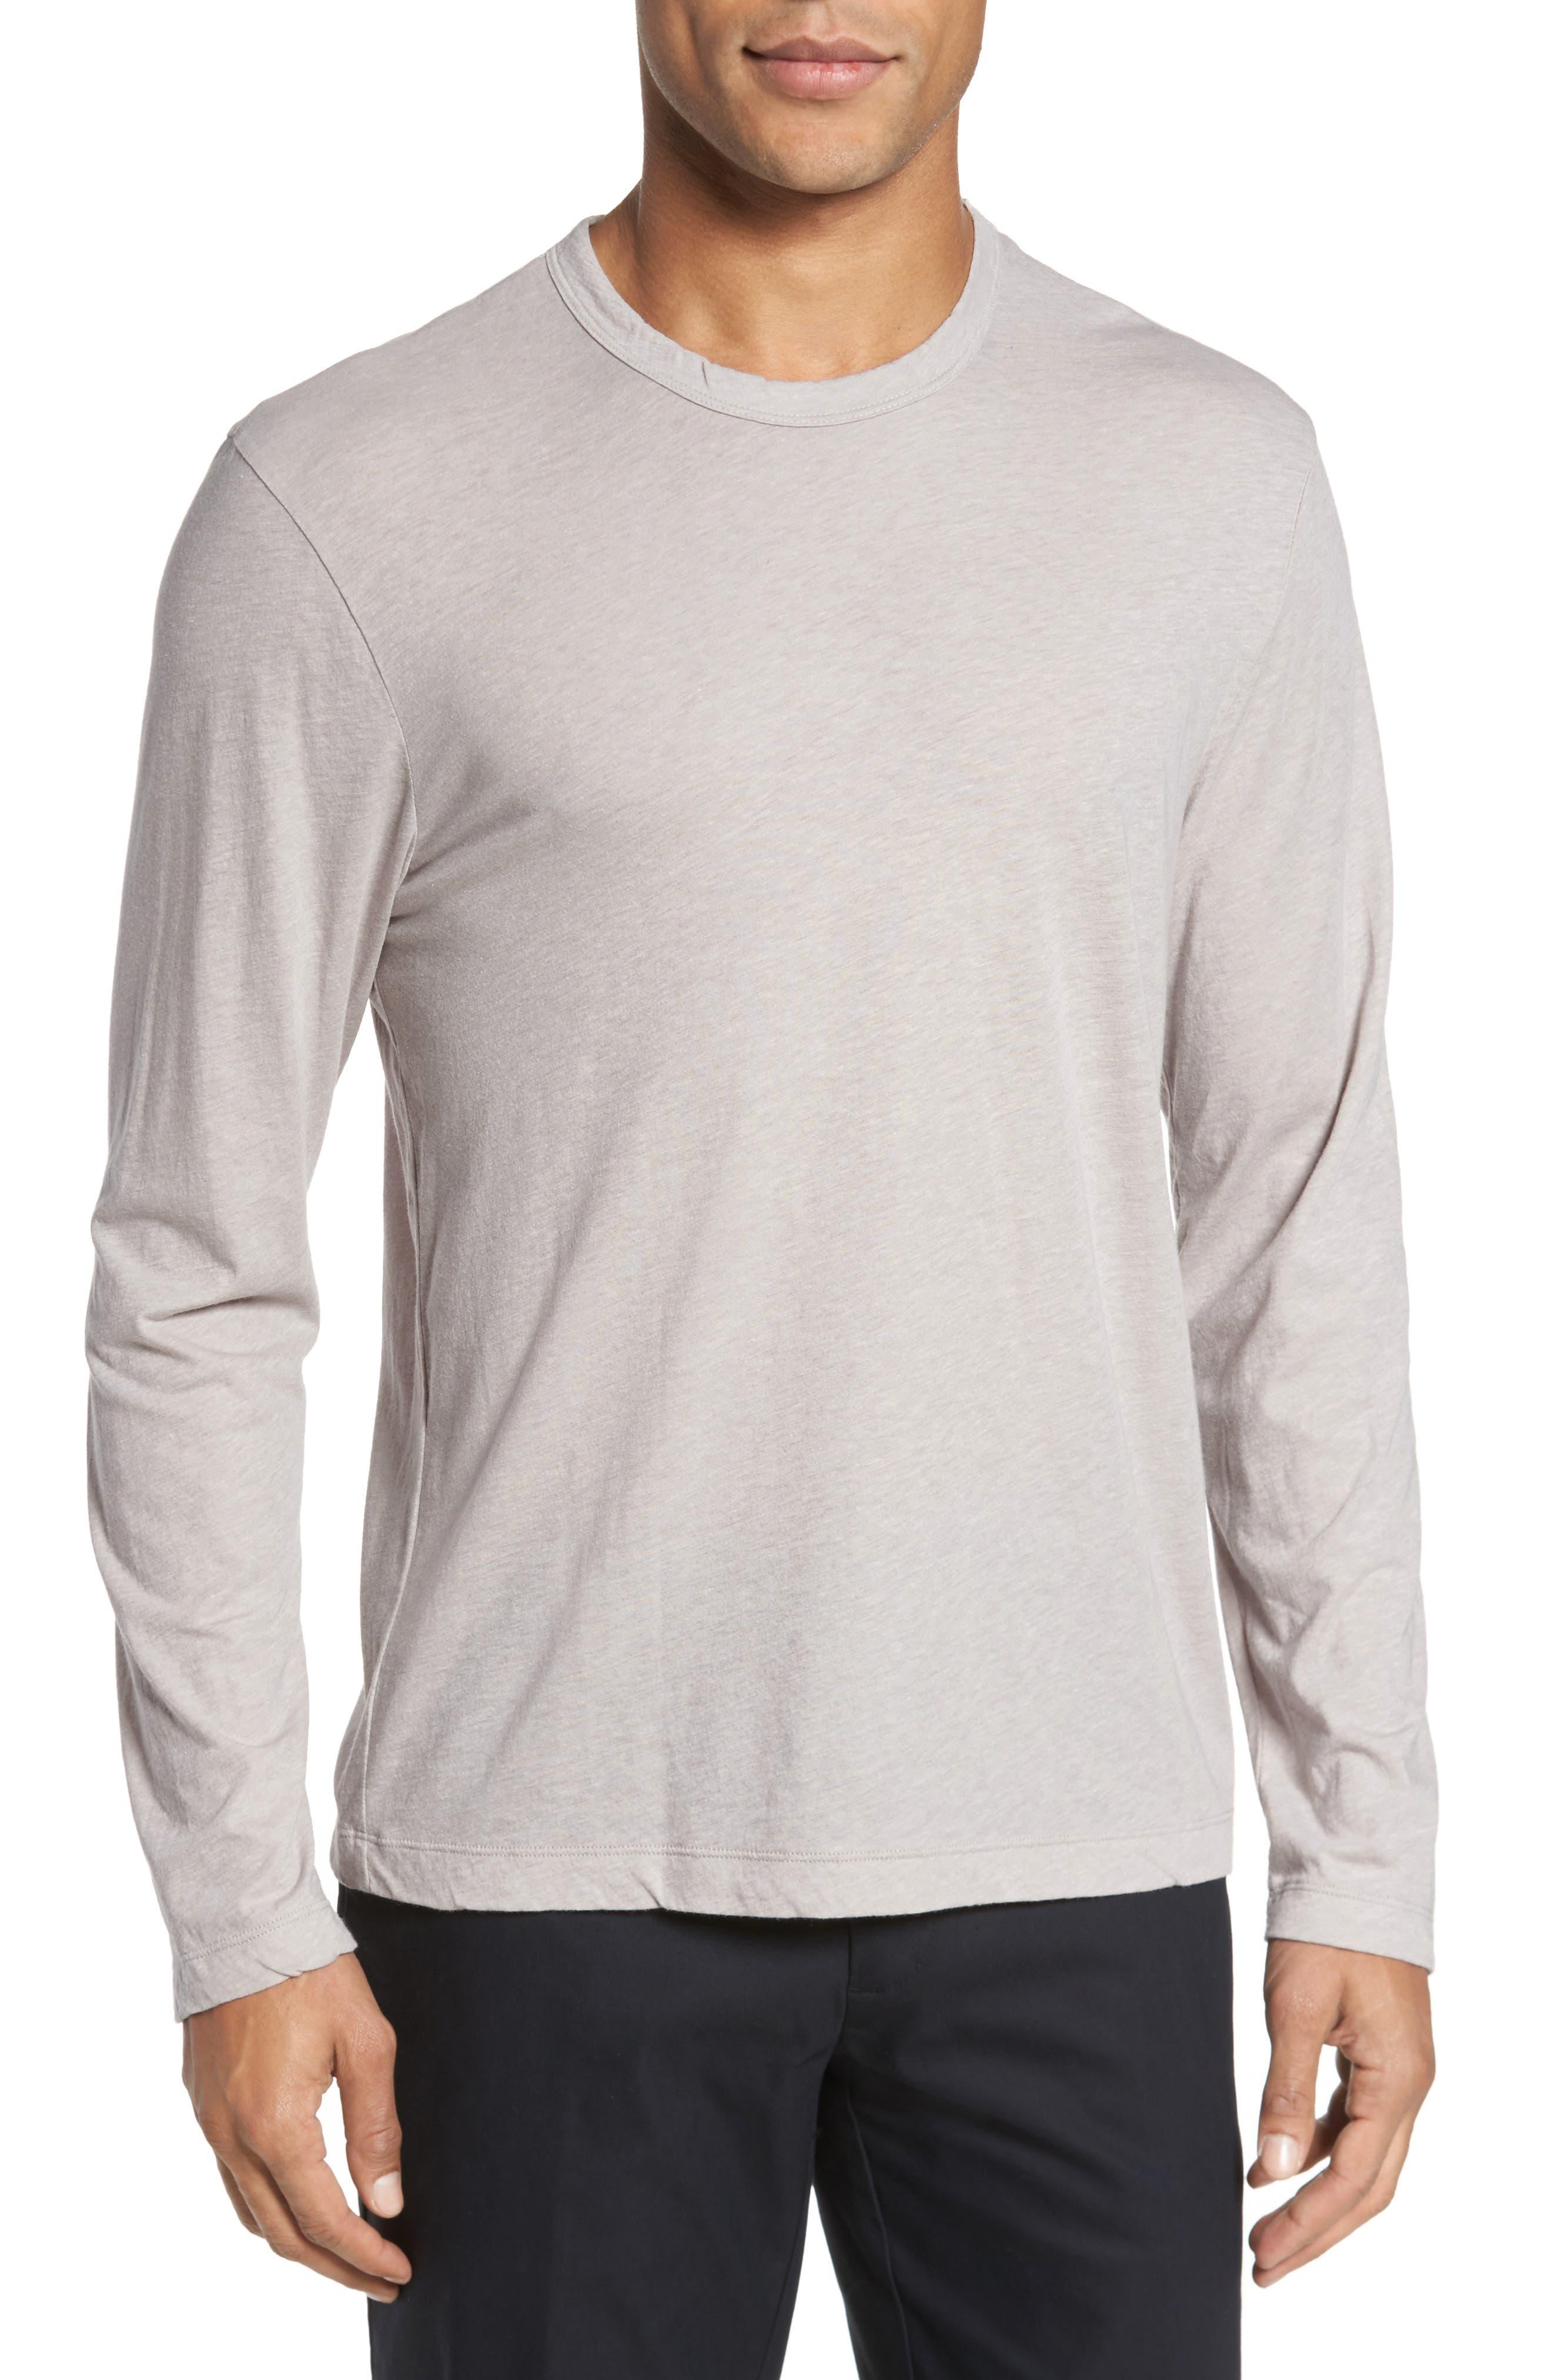 James Perse Mélange Long Sleeve Graphic T-Shirt